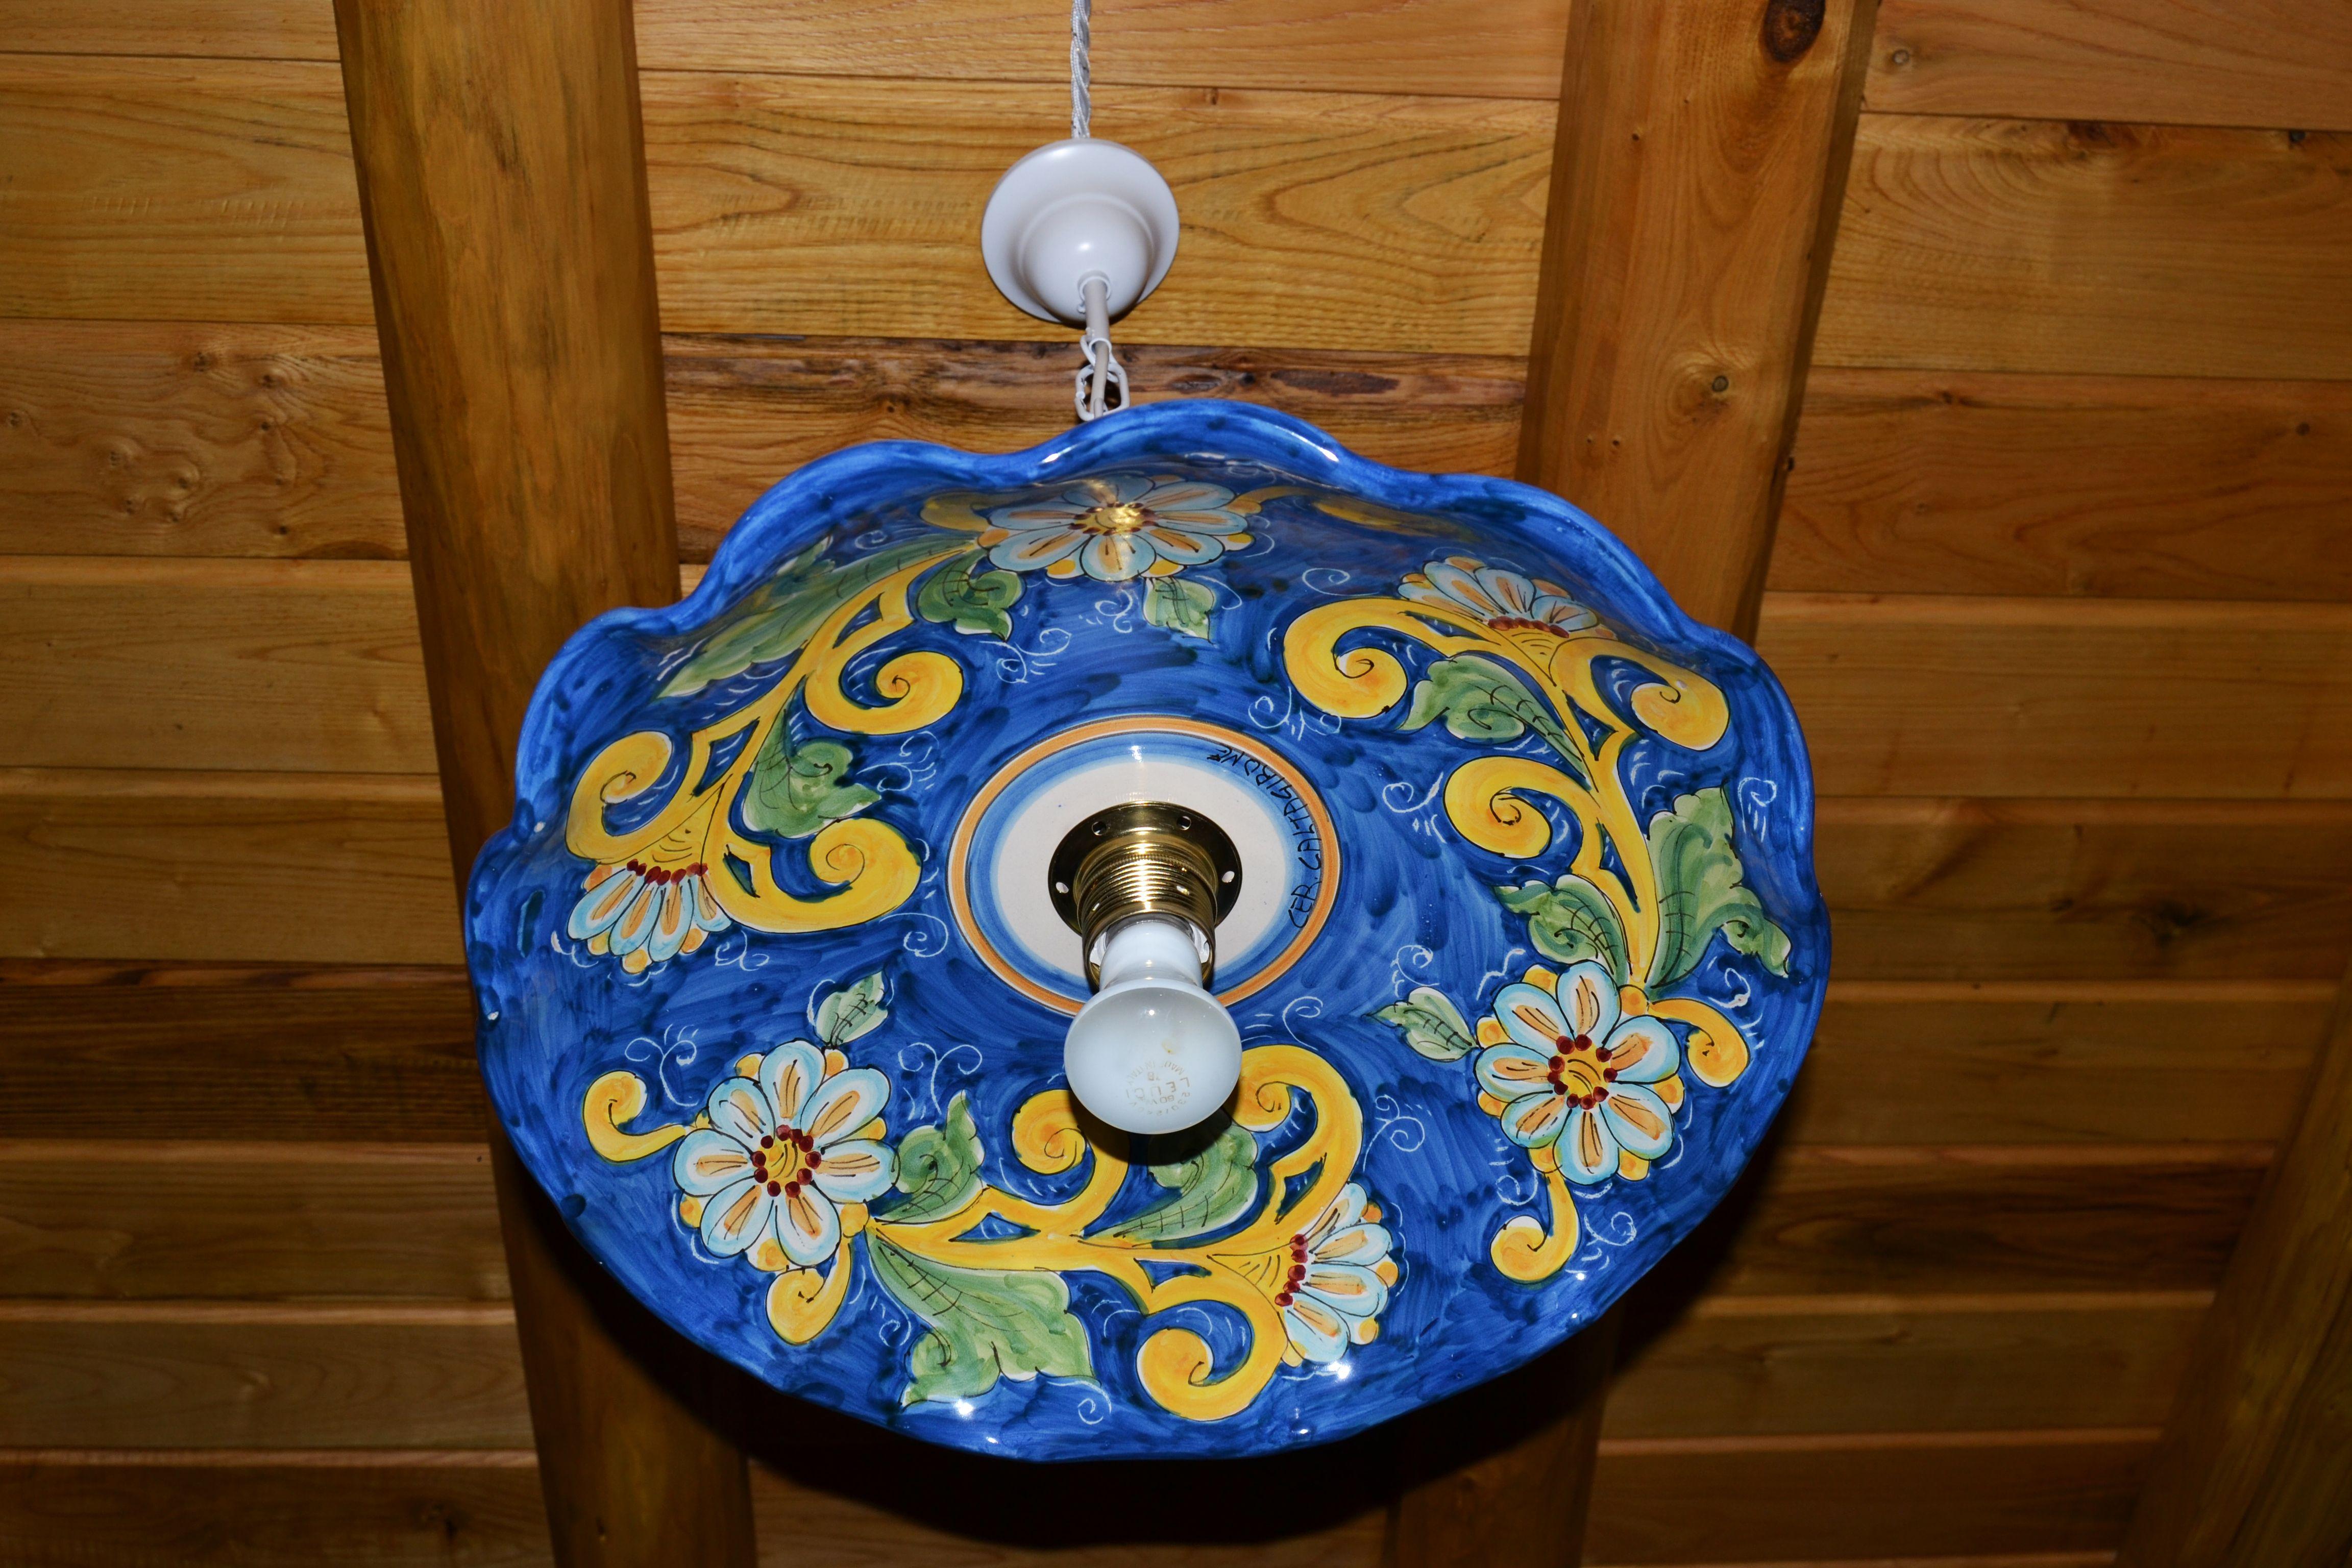 Lampadari In Ceramica Di Caltagirone.Lavabo Ceramica Caltagirone Lavabo Cesame Belle Epoque Catania